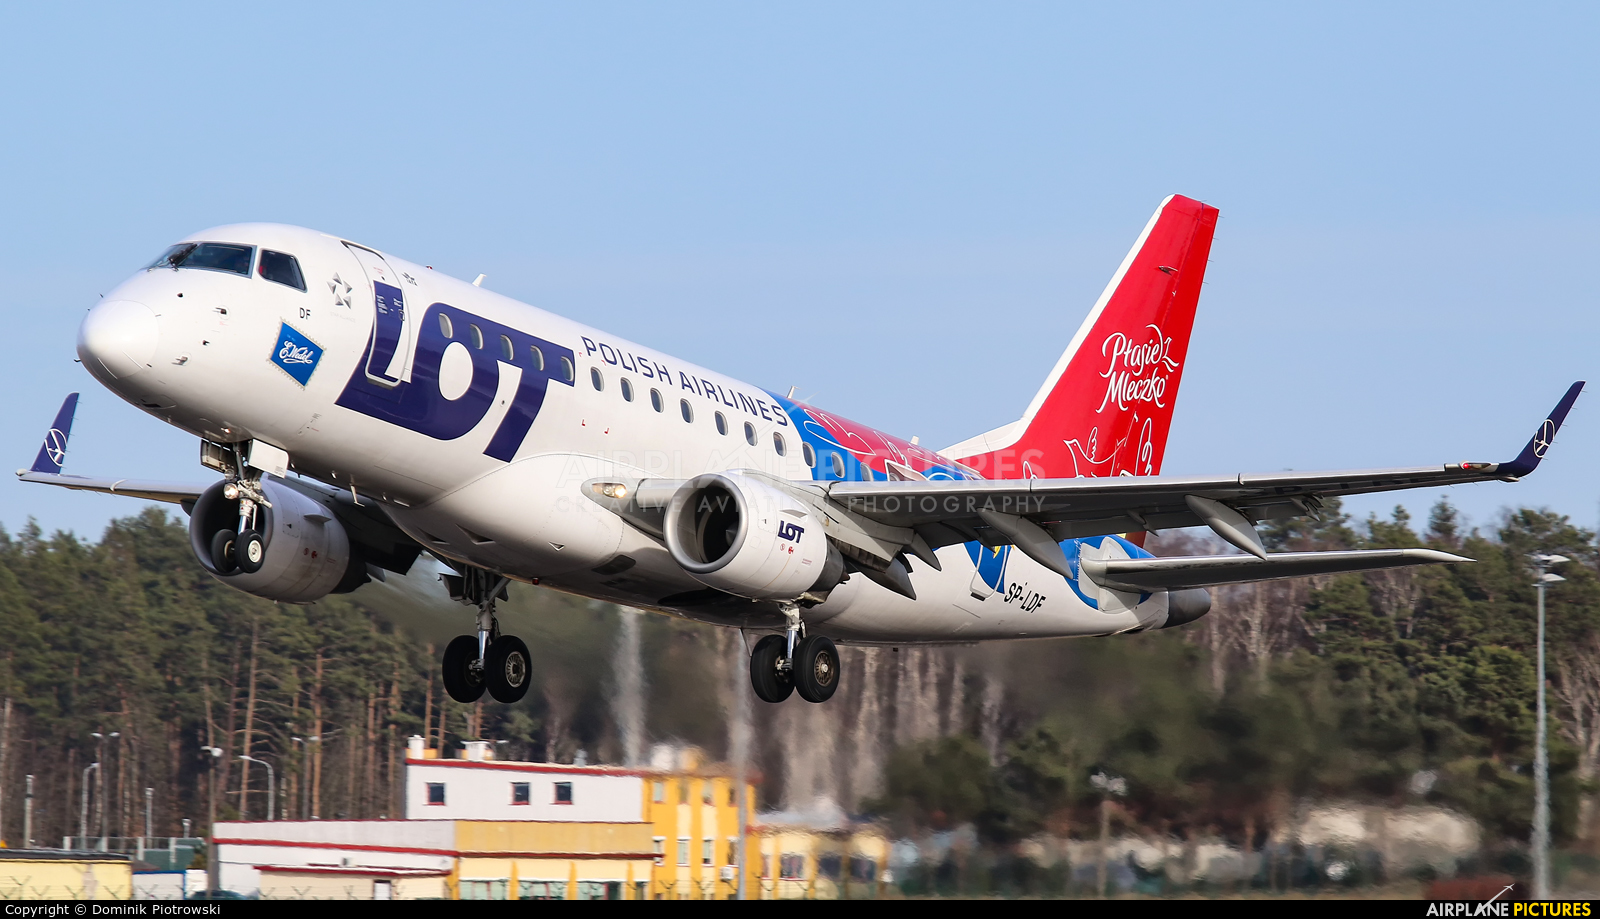 LOT - Polish Airlines SP-LDF aircraft at Gdańsk - Lech Wałęsa